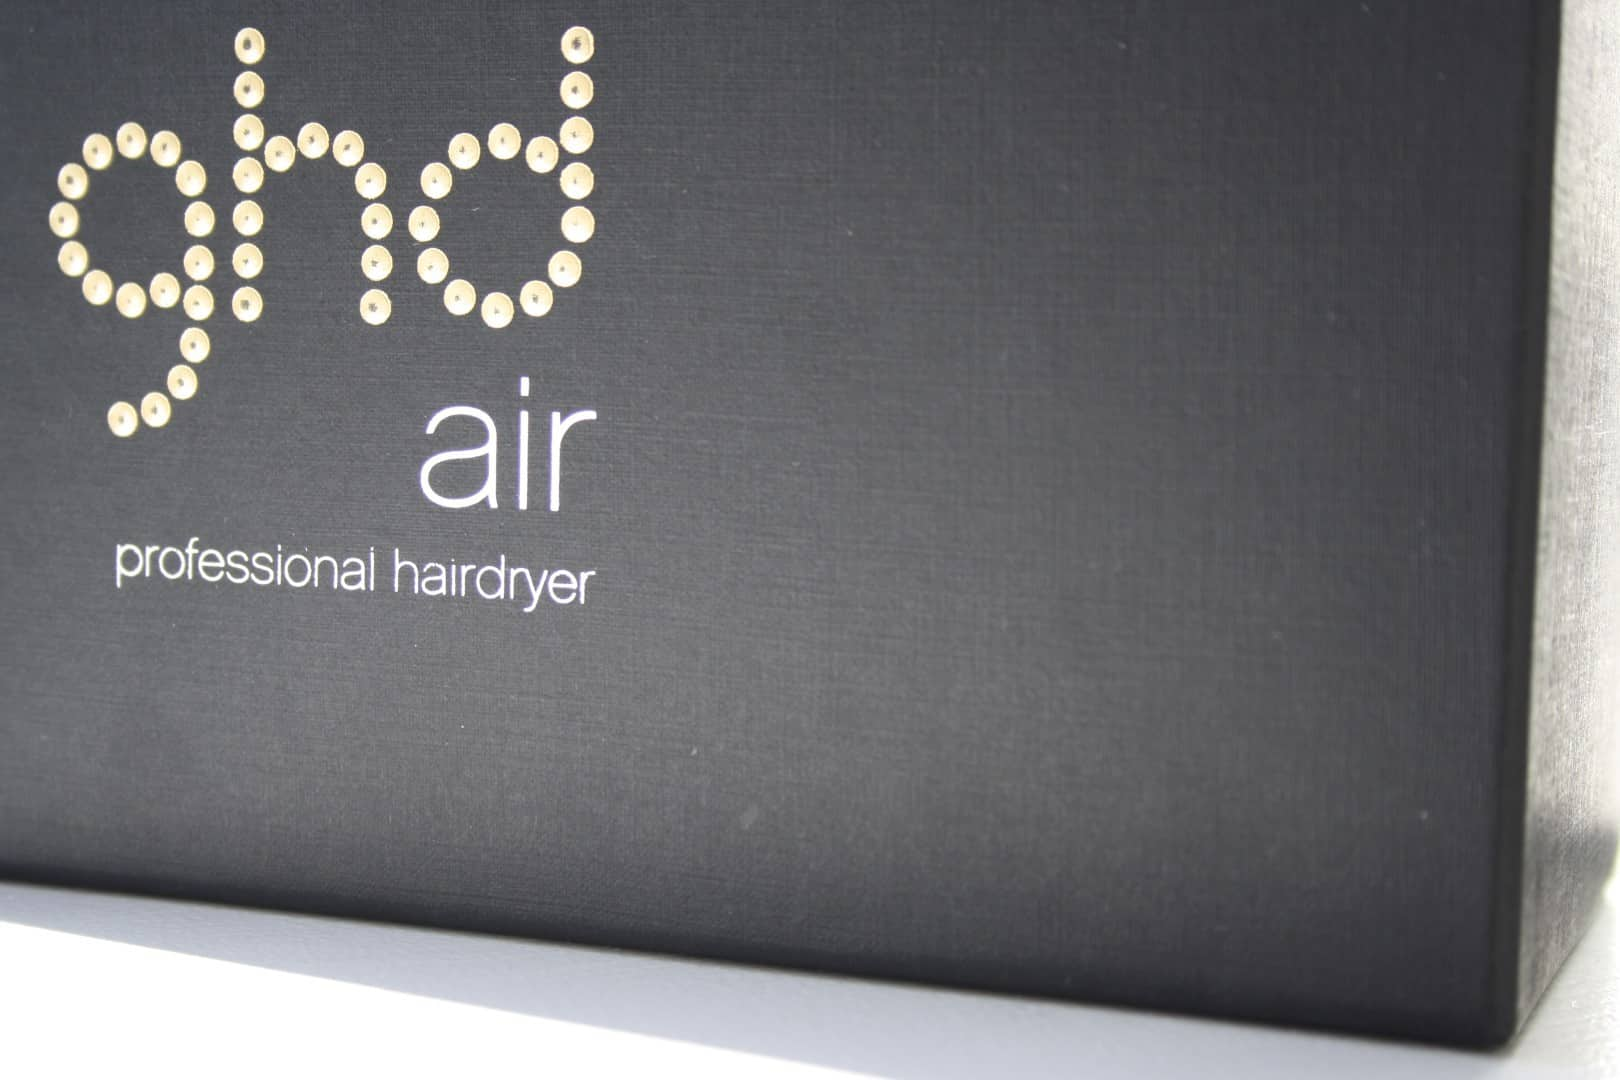 Hårtørrer test – GHD Air